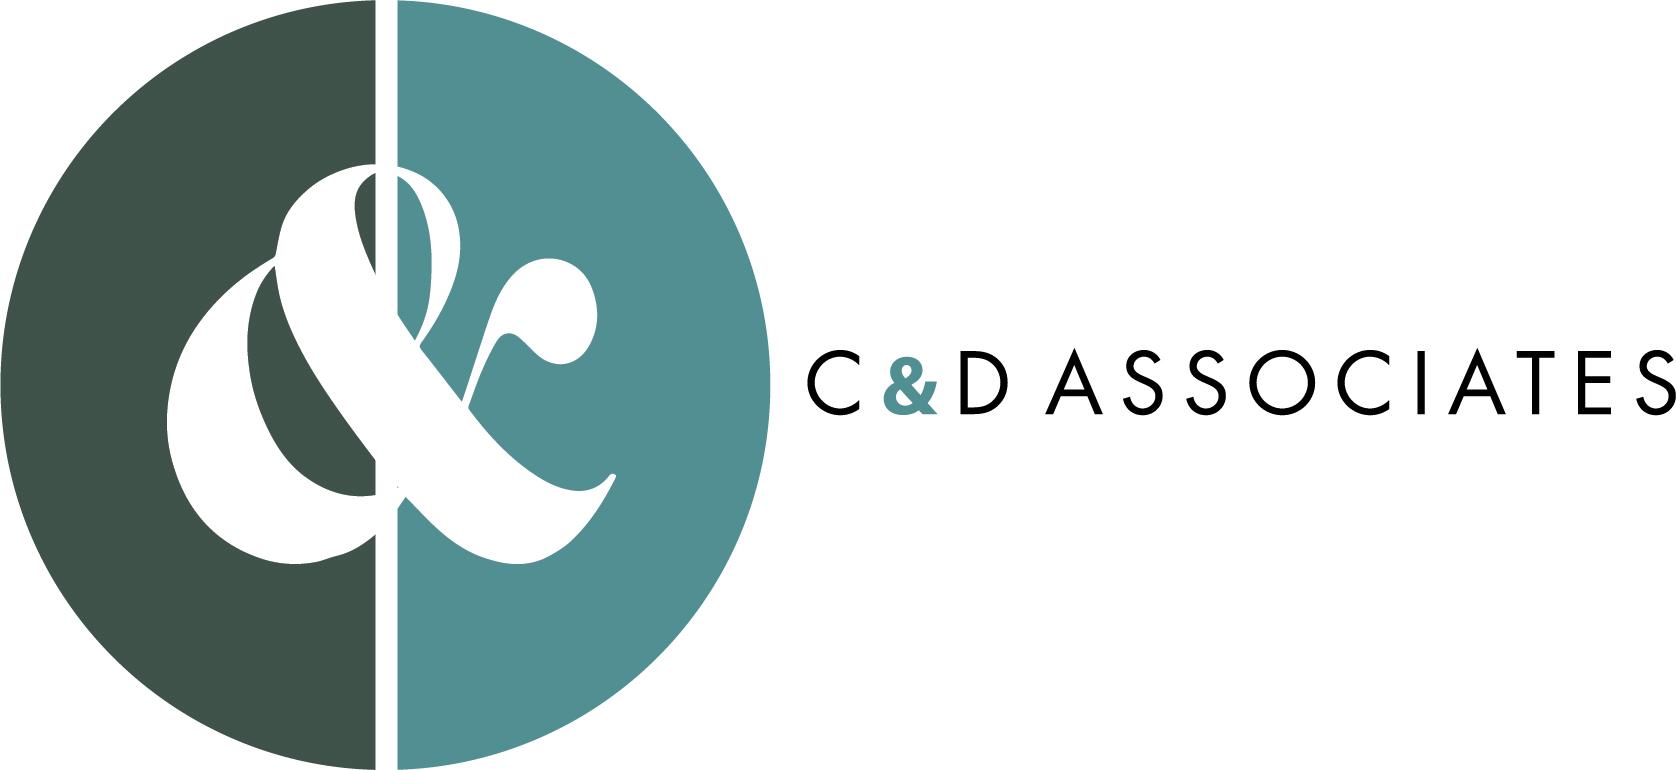 C&D Associates, alumni business sponsor